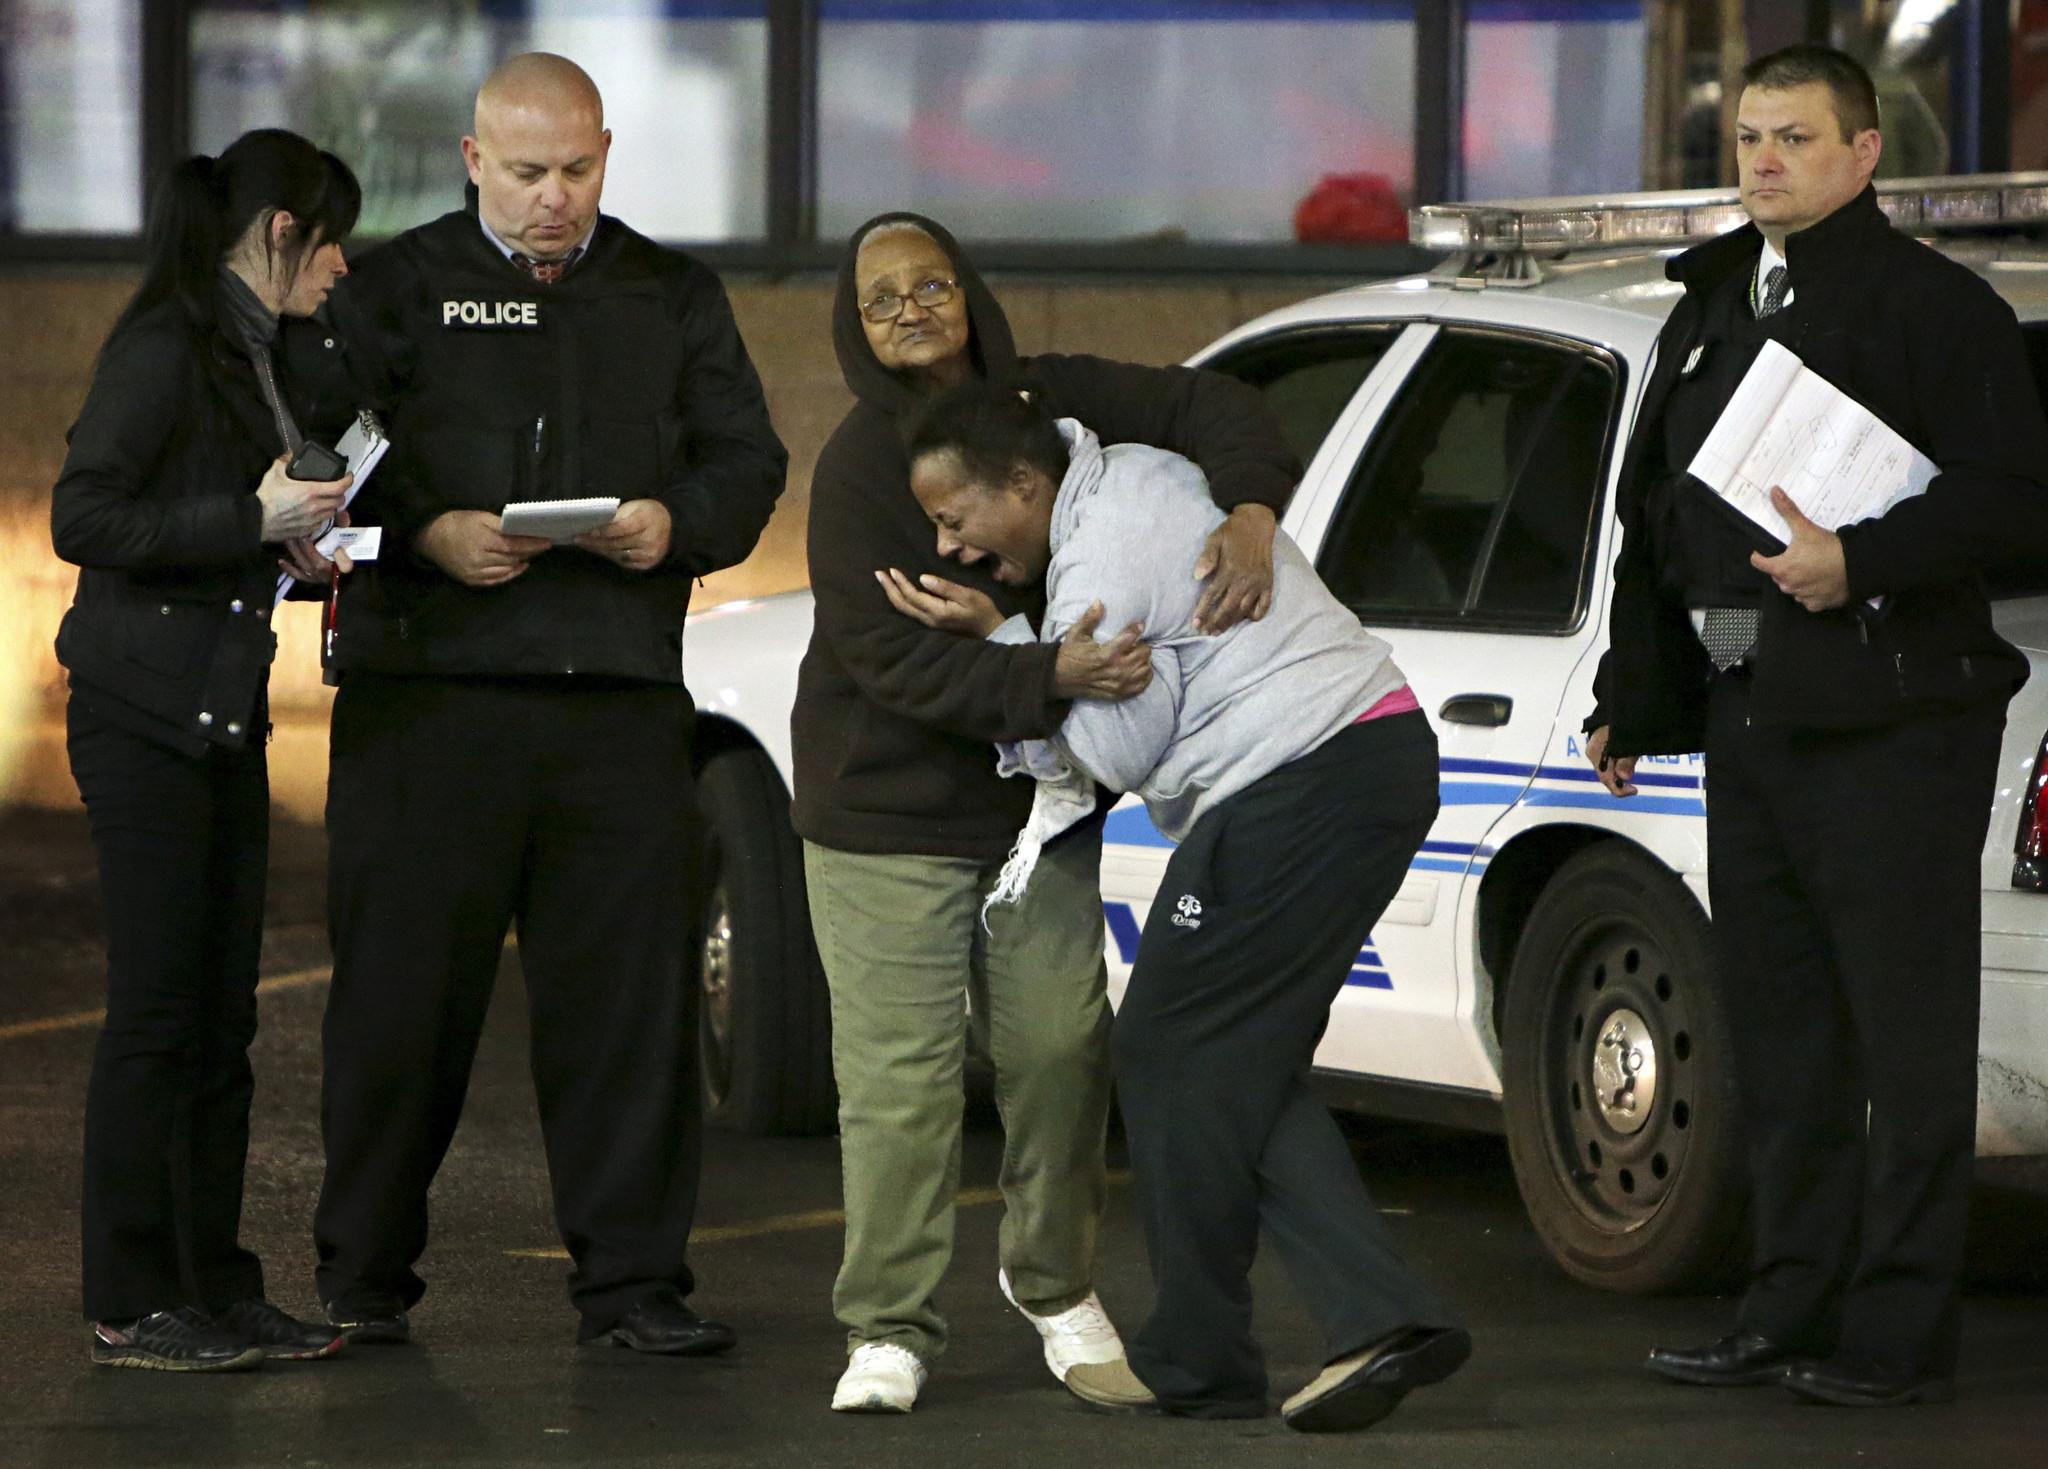 Protests, vigils follow shooting near Ferguson